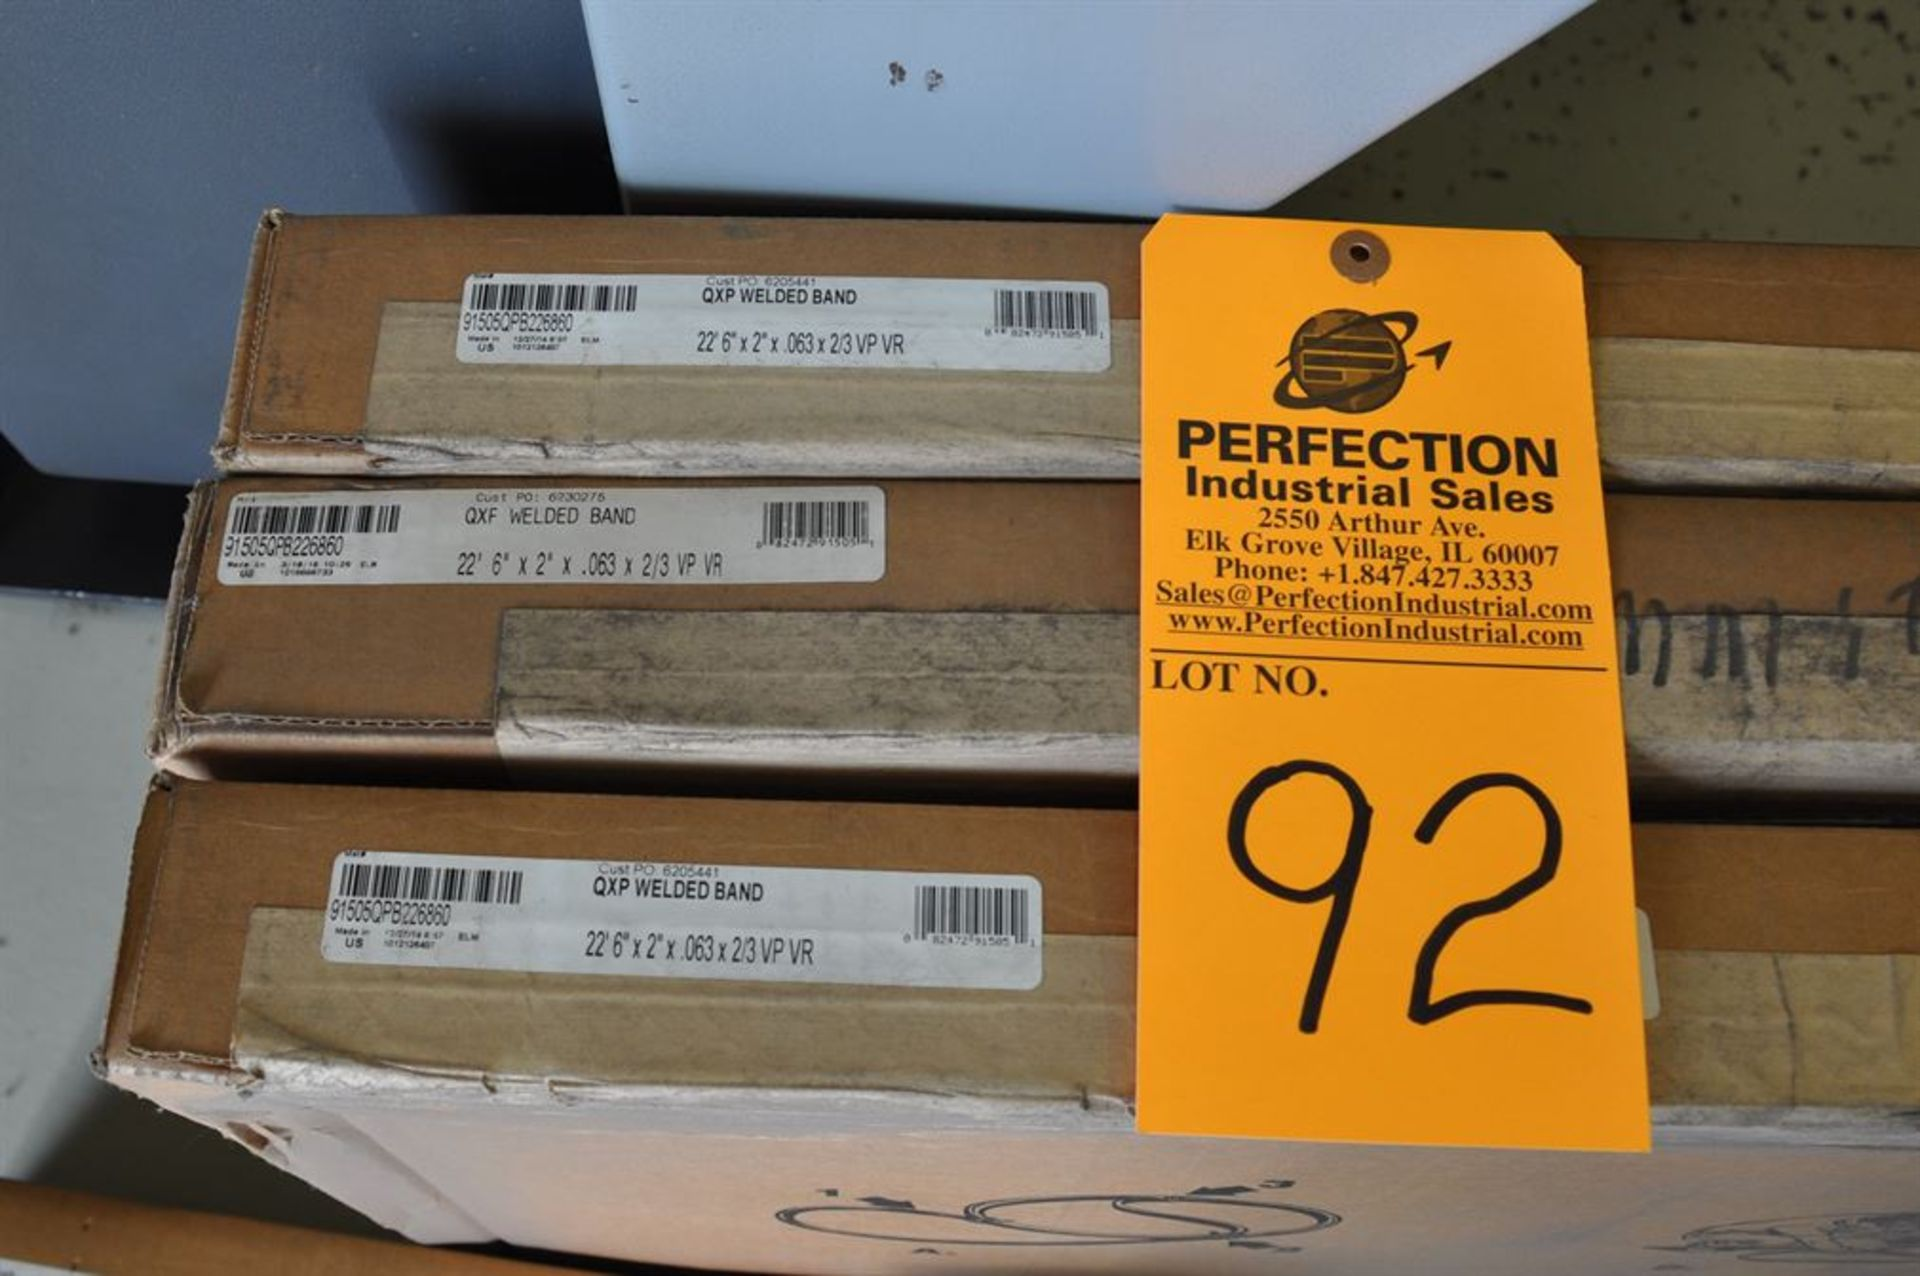 "Lenox (3) New Bandsaw Blades 22' 6"" x 2"" x .063 x 2/3 VP VR - Image 2 of 2"